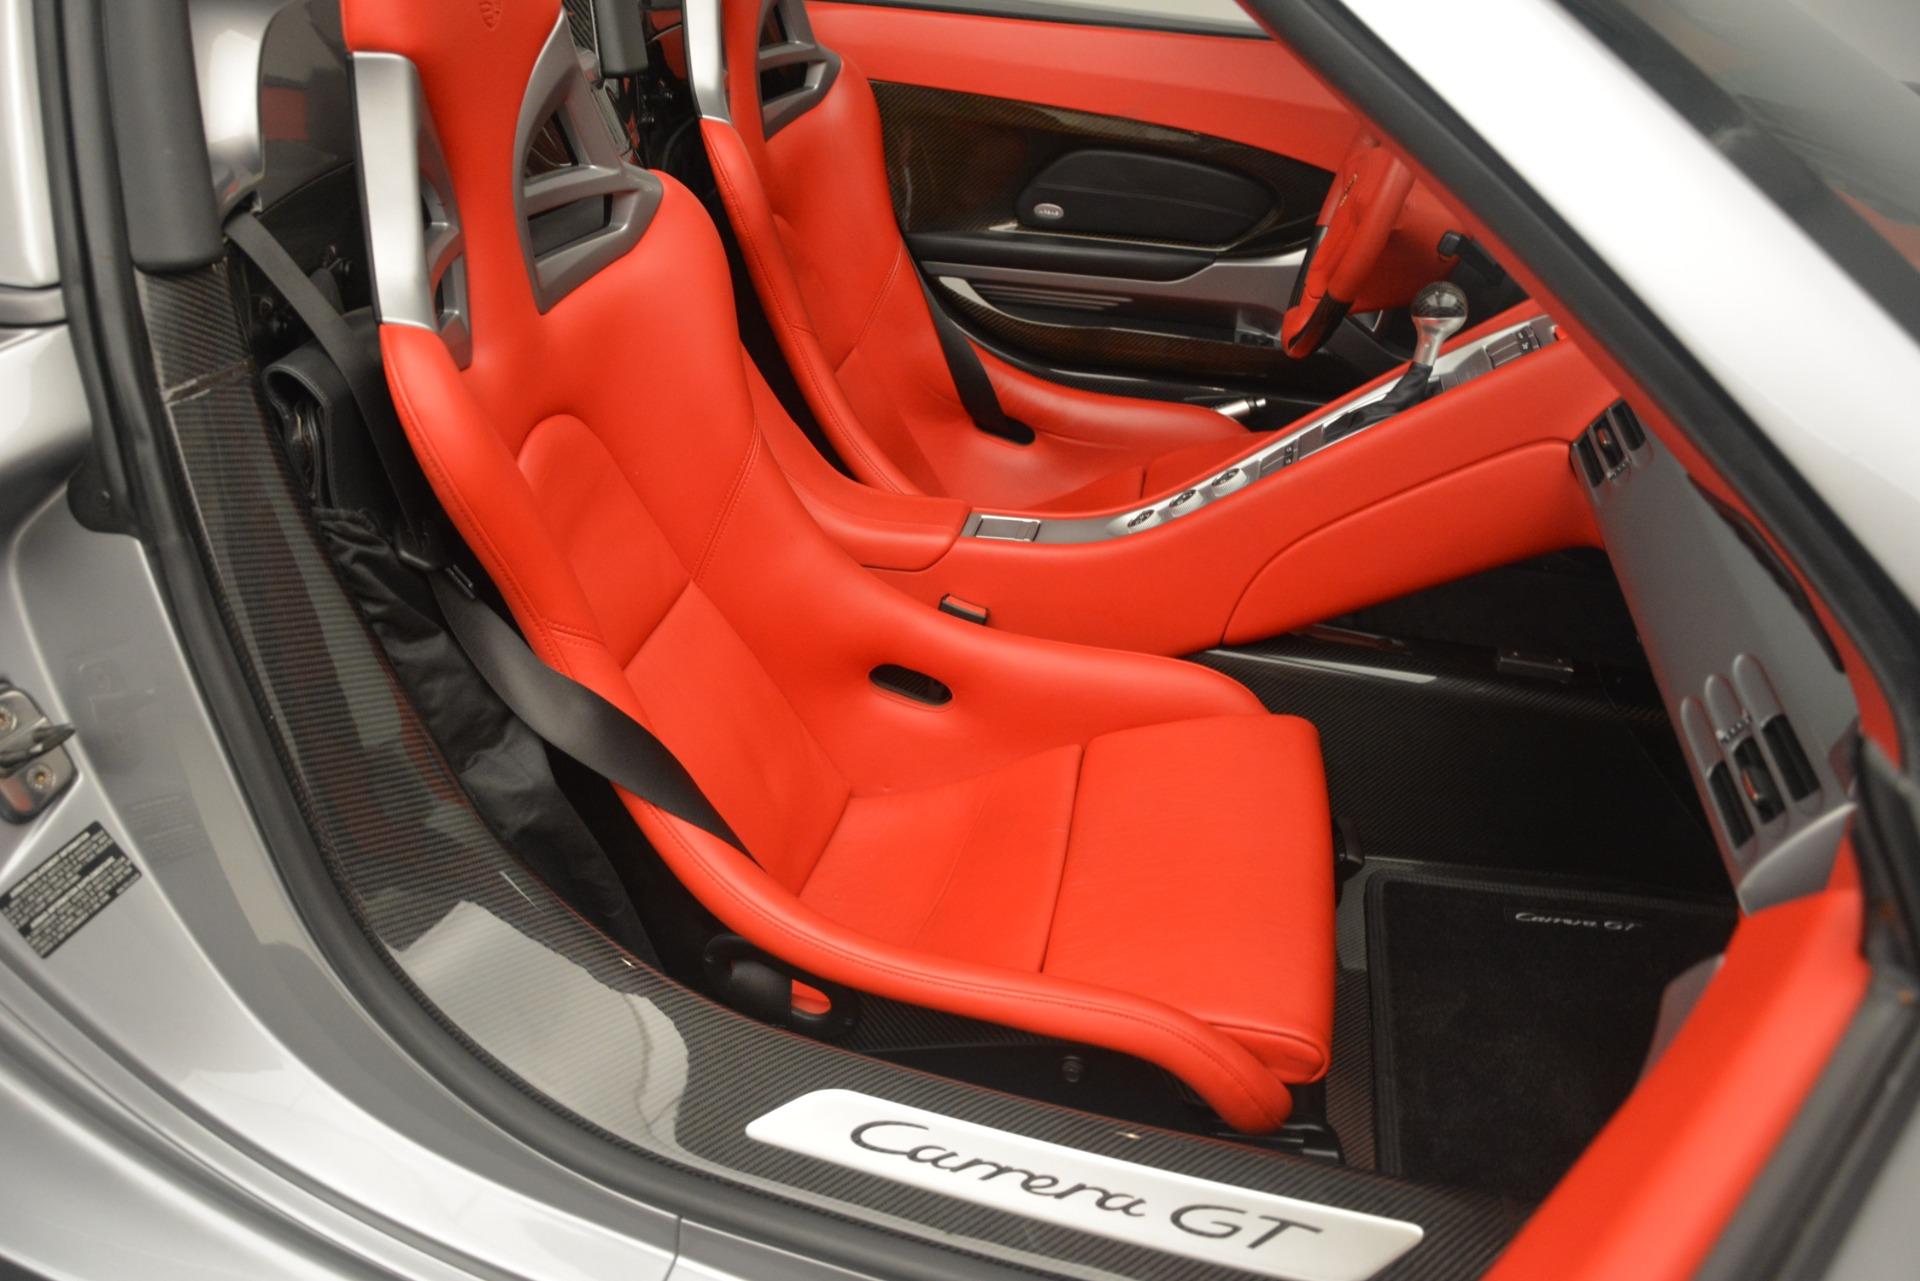 Used 2005 Porsche Carrera GT  For Sale In Greenwich, CT 3161_p33